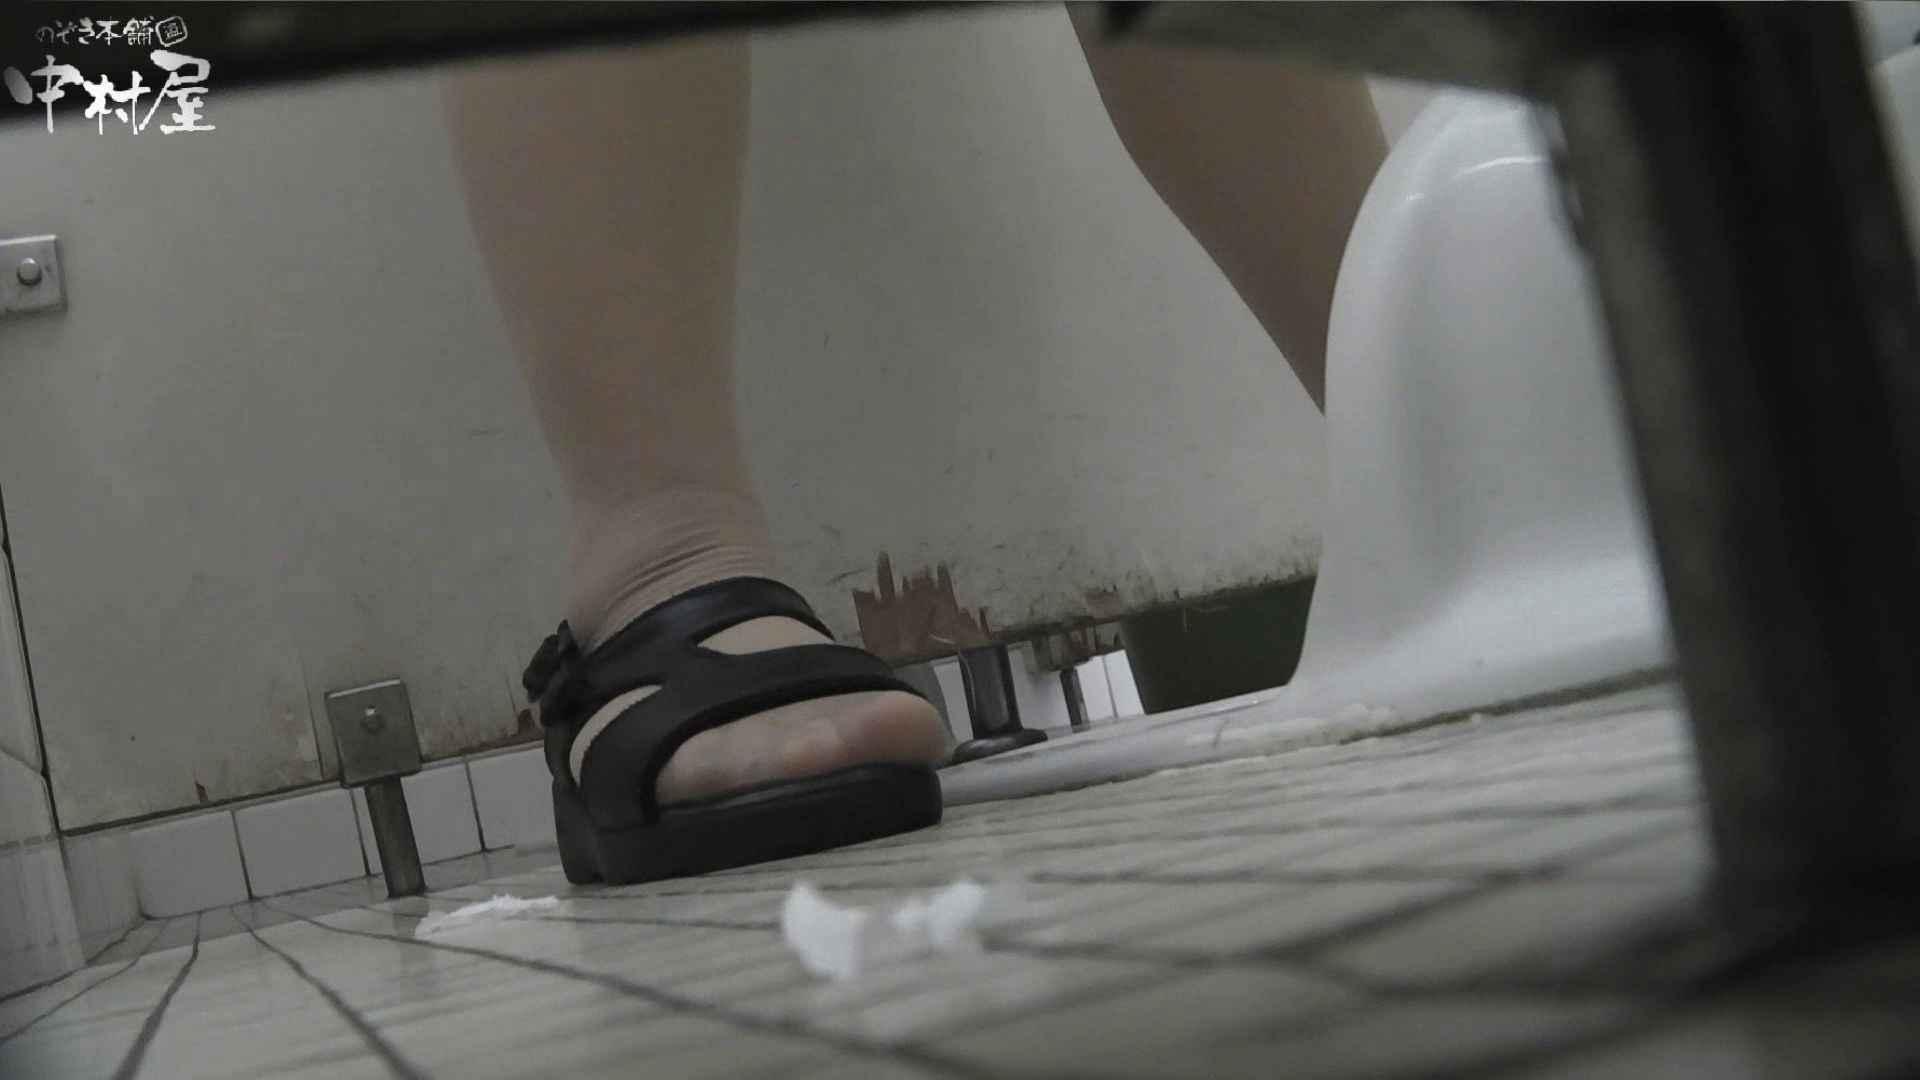 vol.44 命がけ潜伏洗面所! ツインテール(゚∀゚)キタコレ!! 洗面所編 | プライベート  77PIX 16